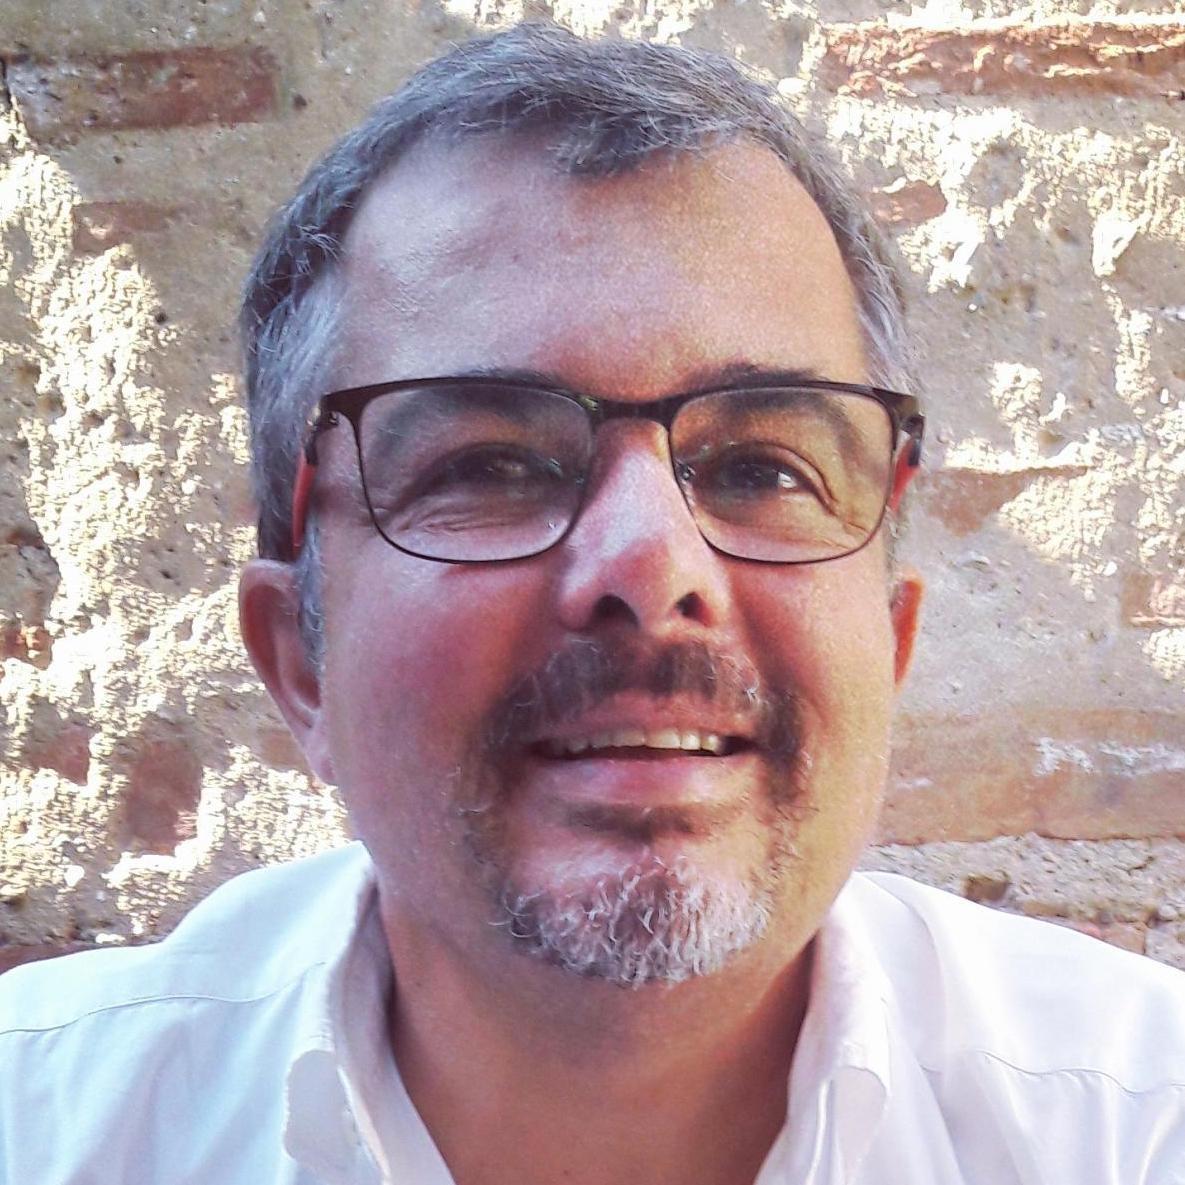 Artisan Jean Rene, Professionnel de l'isolation